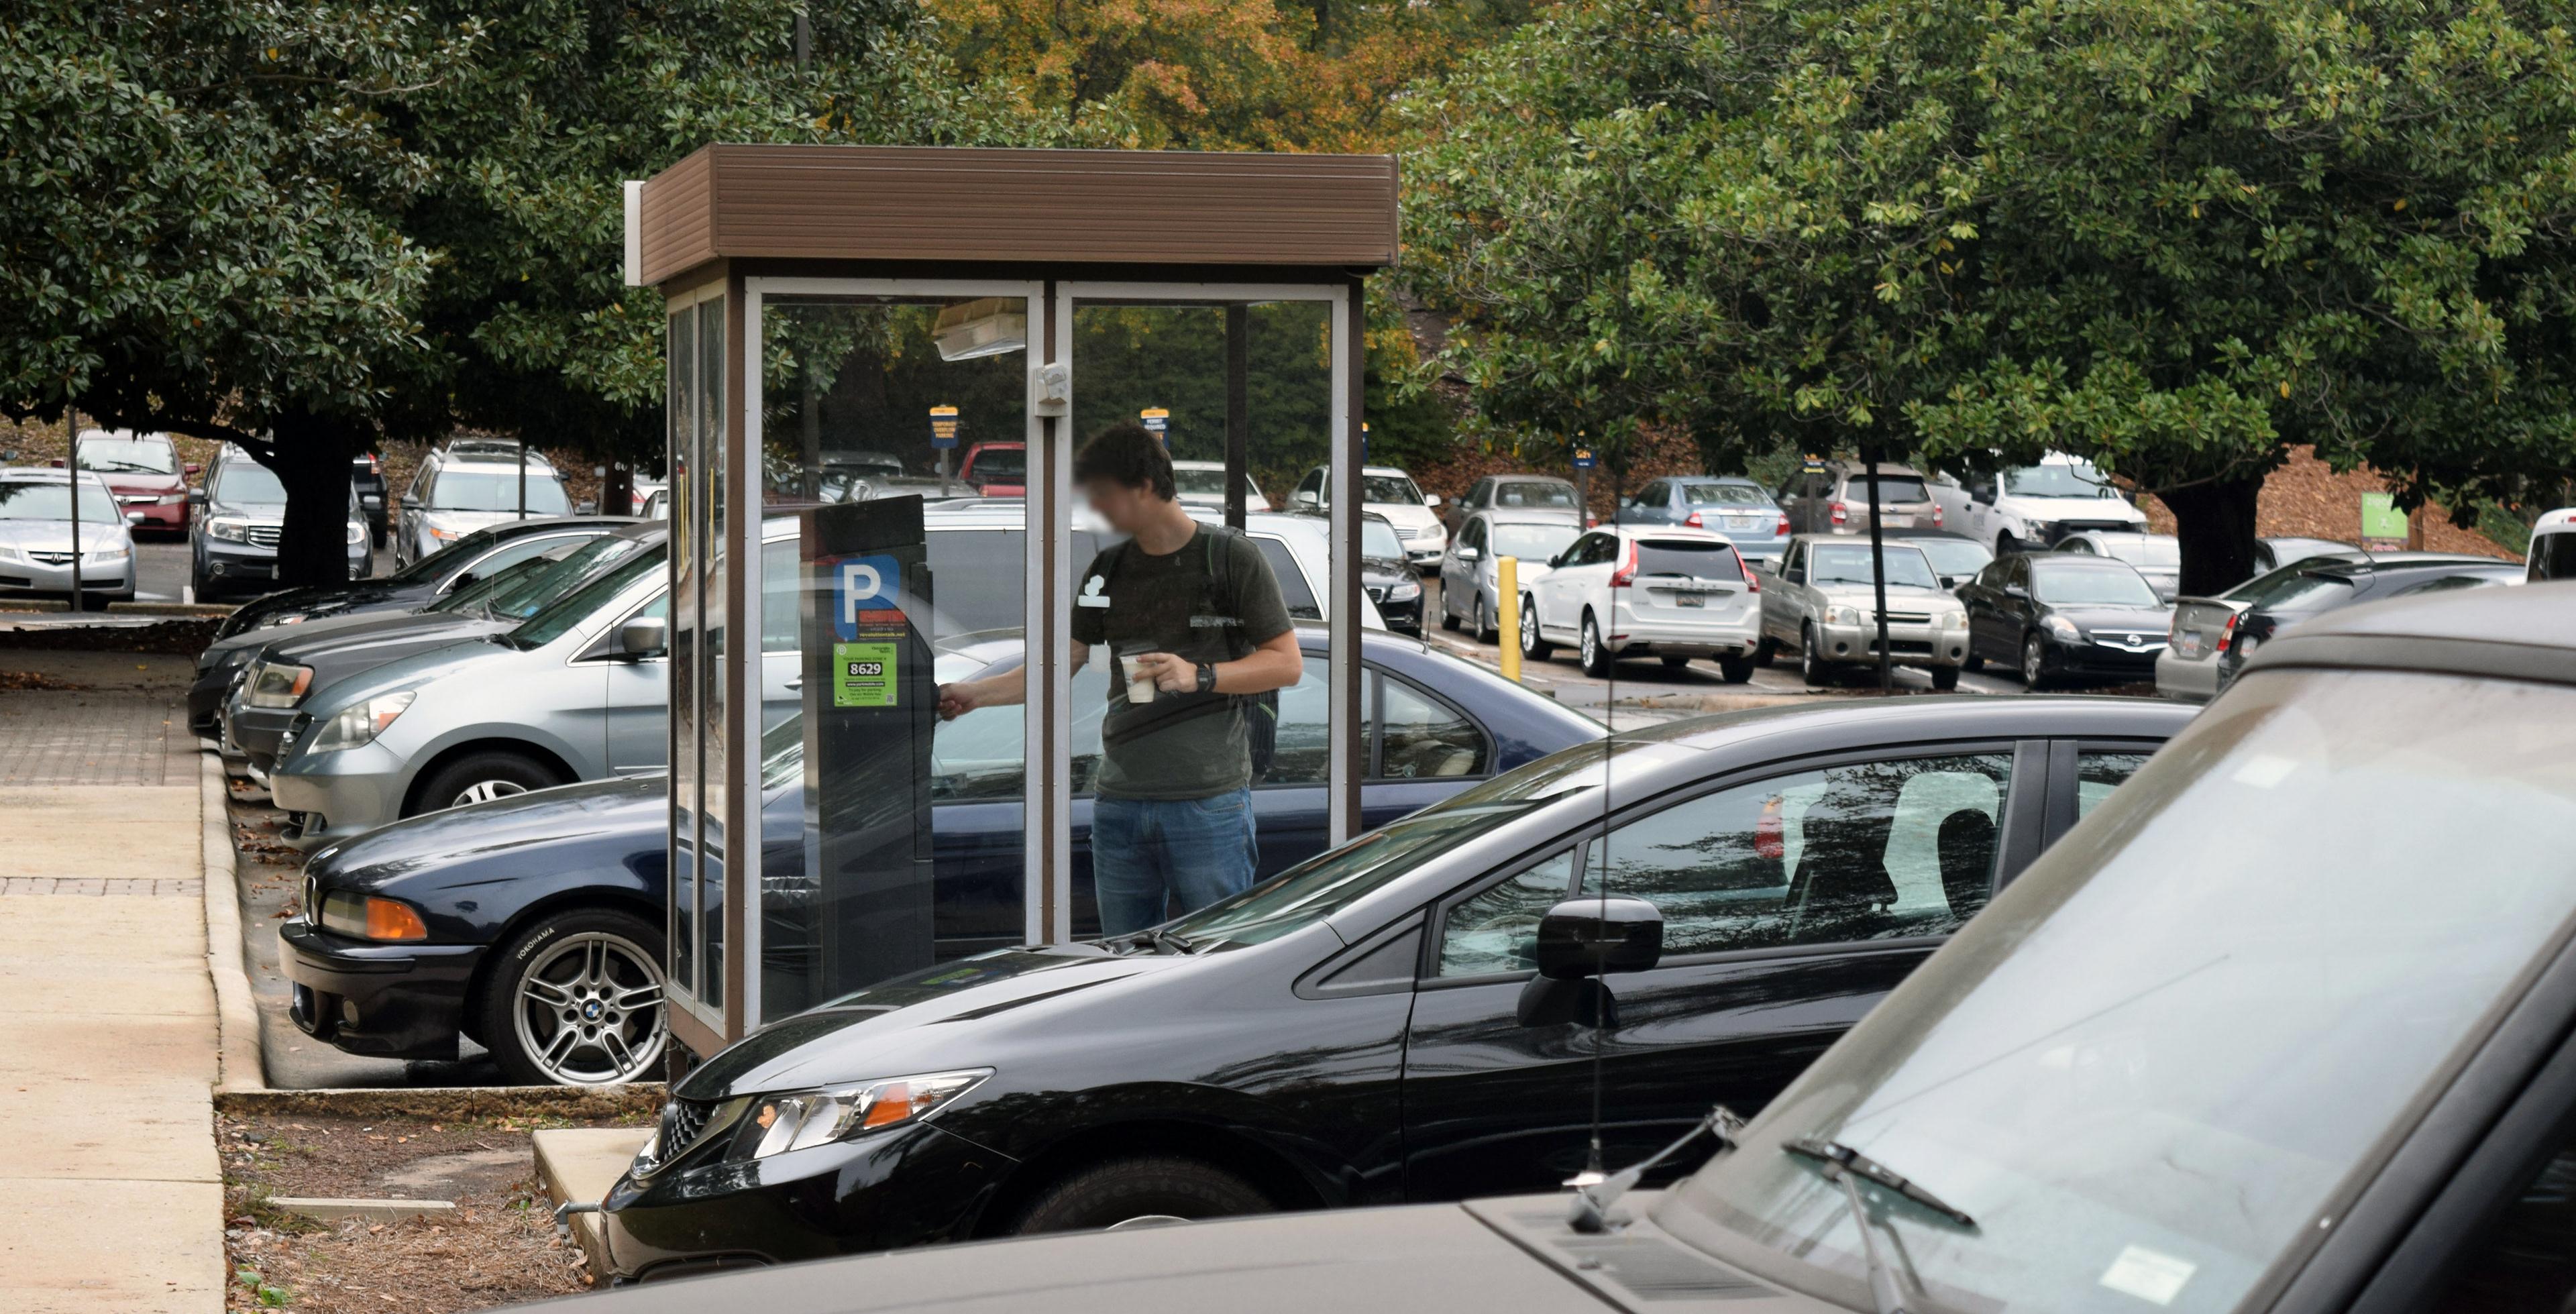 Kelsie Thomas Parking Kiosk